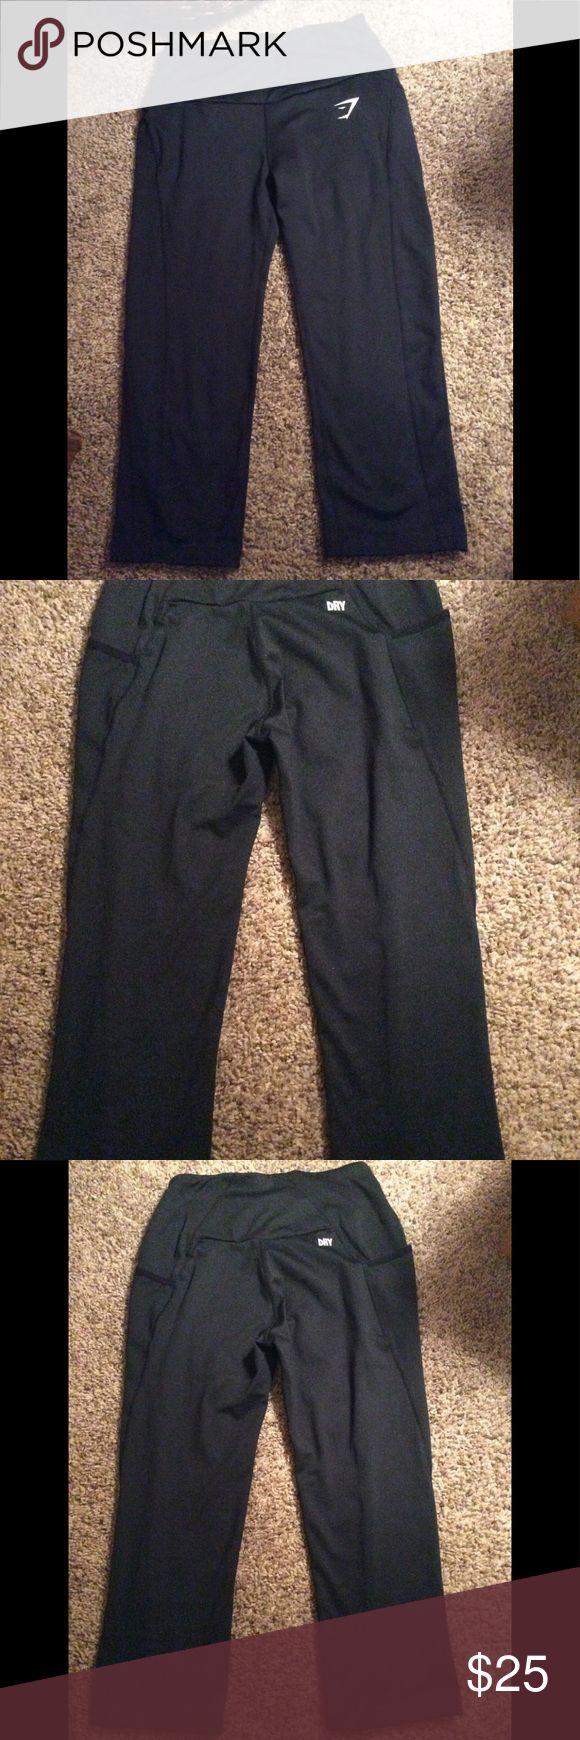 Gymshark Capri pant Gymshark Capri pant with side pockets black small excellent condition. gymshark Pants Capris